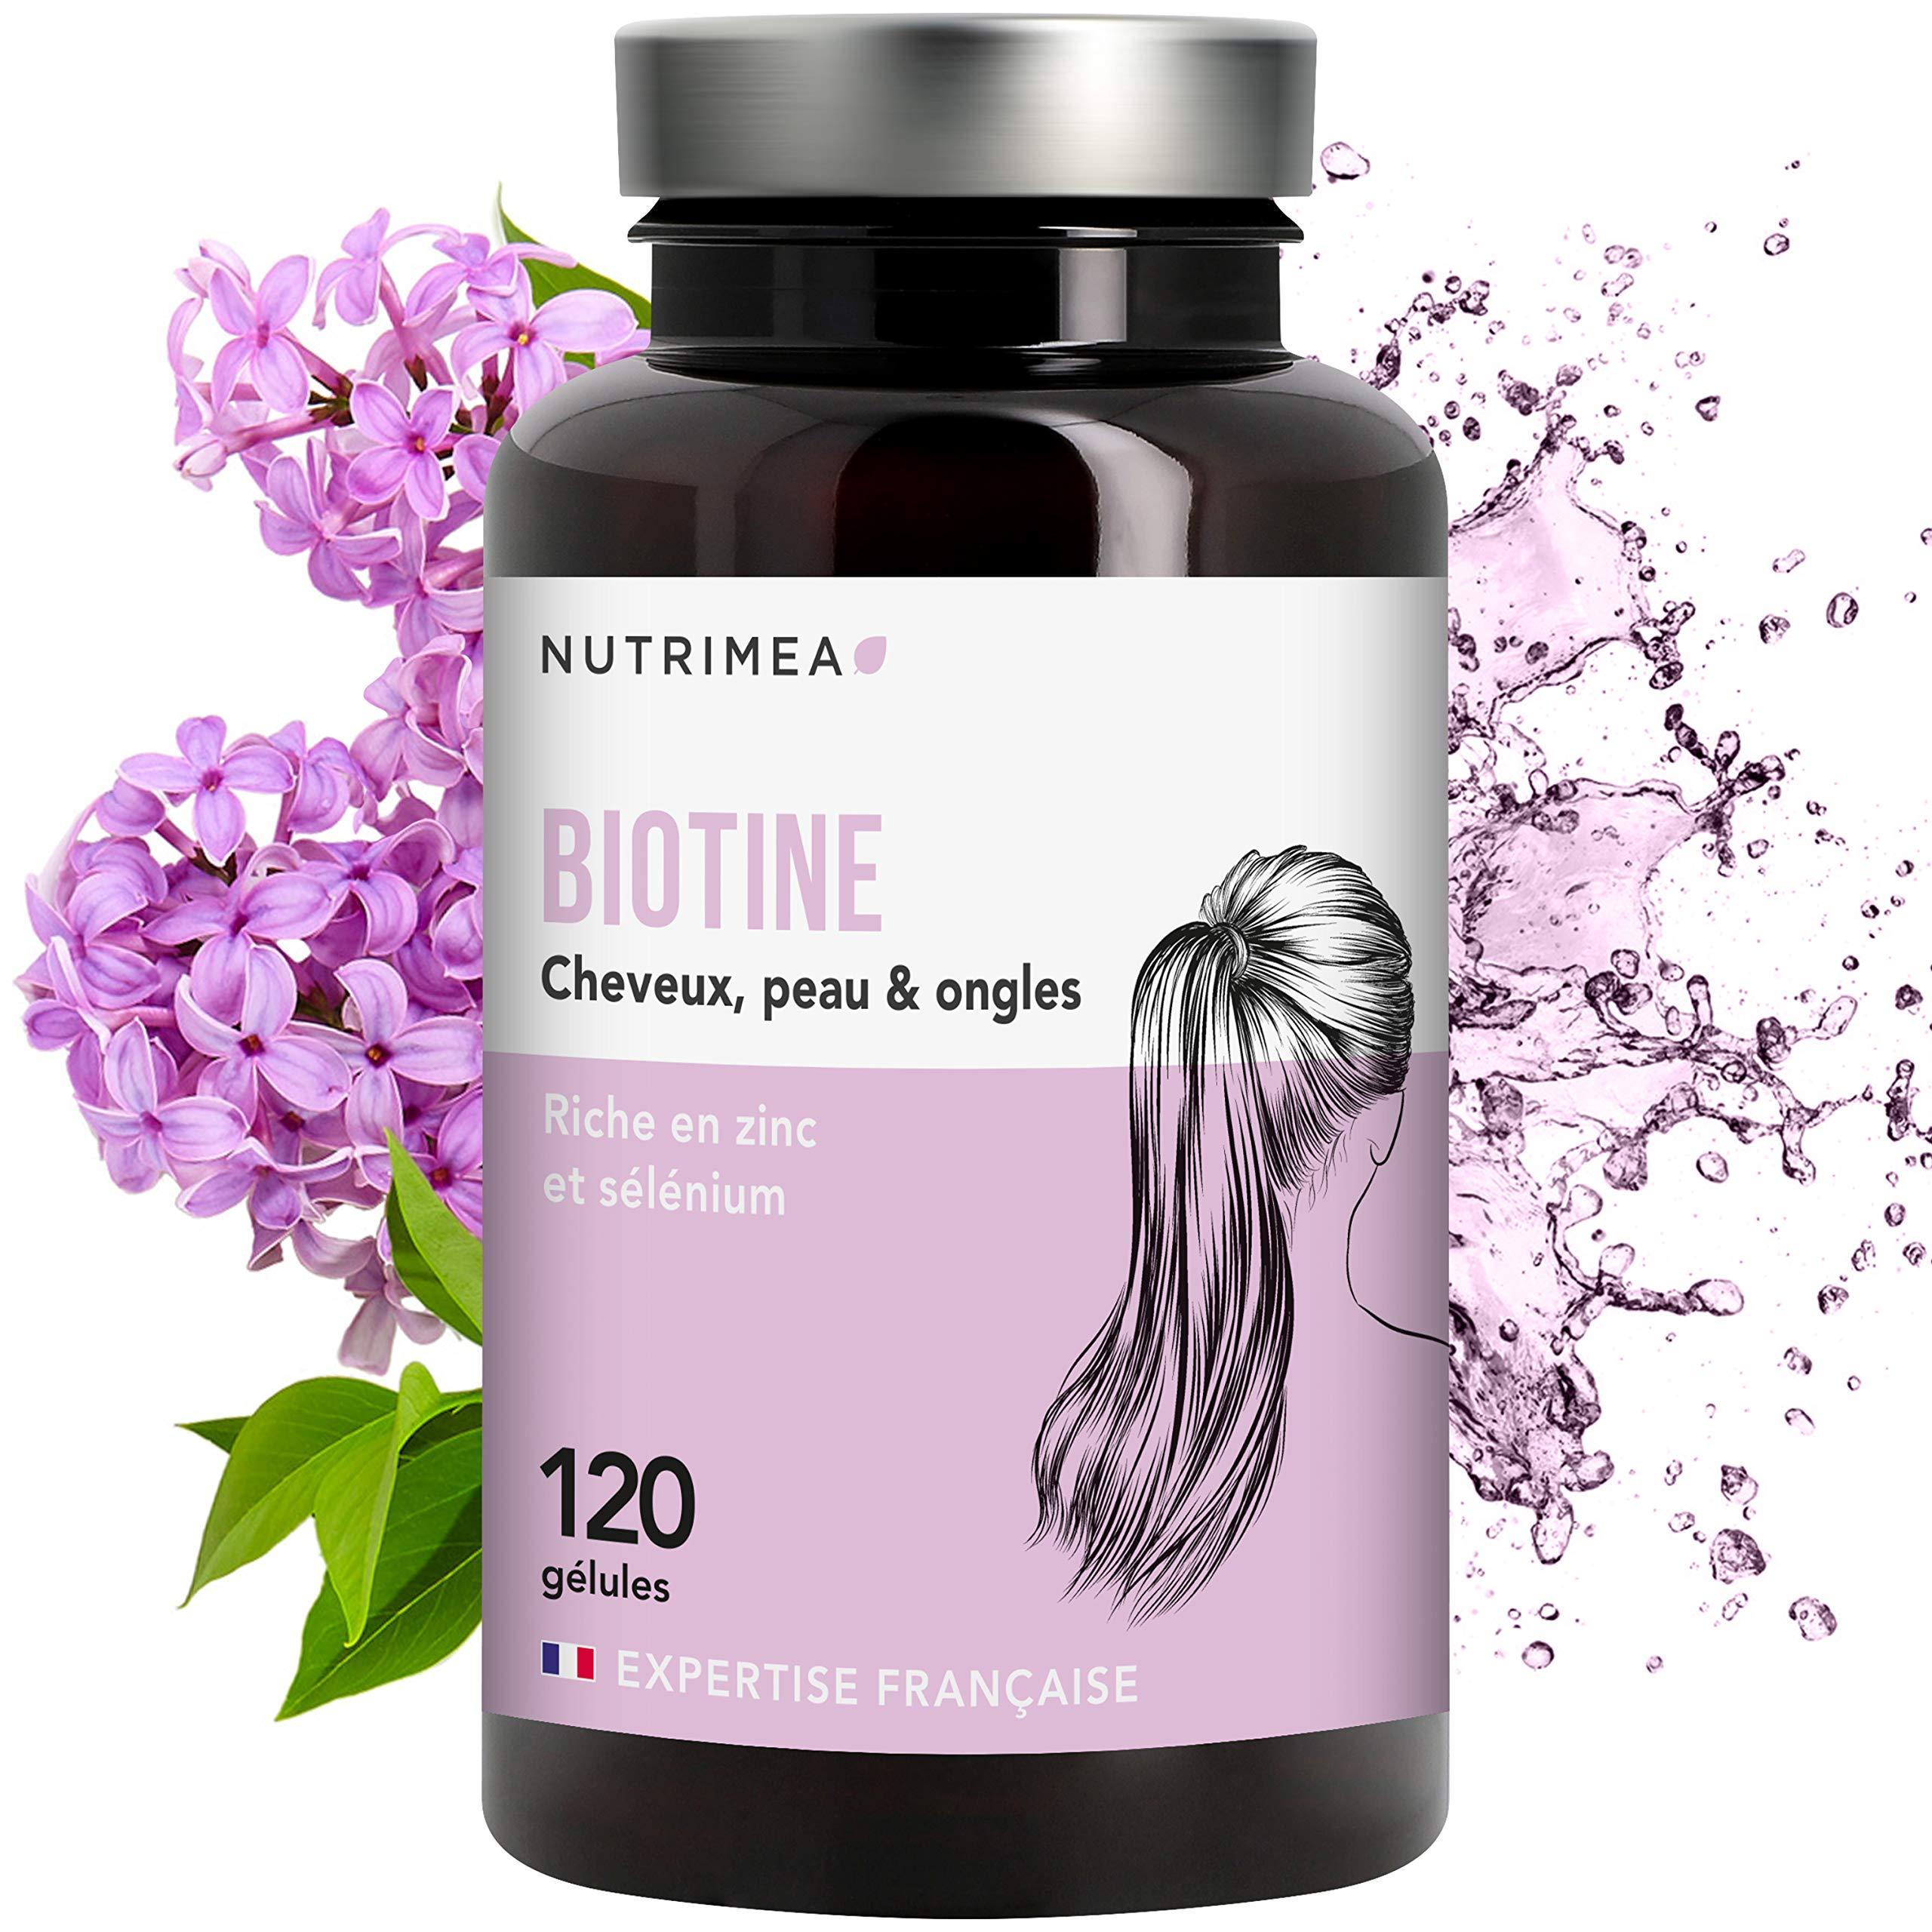 Promos Vitamine B7 (Biotine),Epicerie - App4promos bda2c5bf7eb